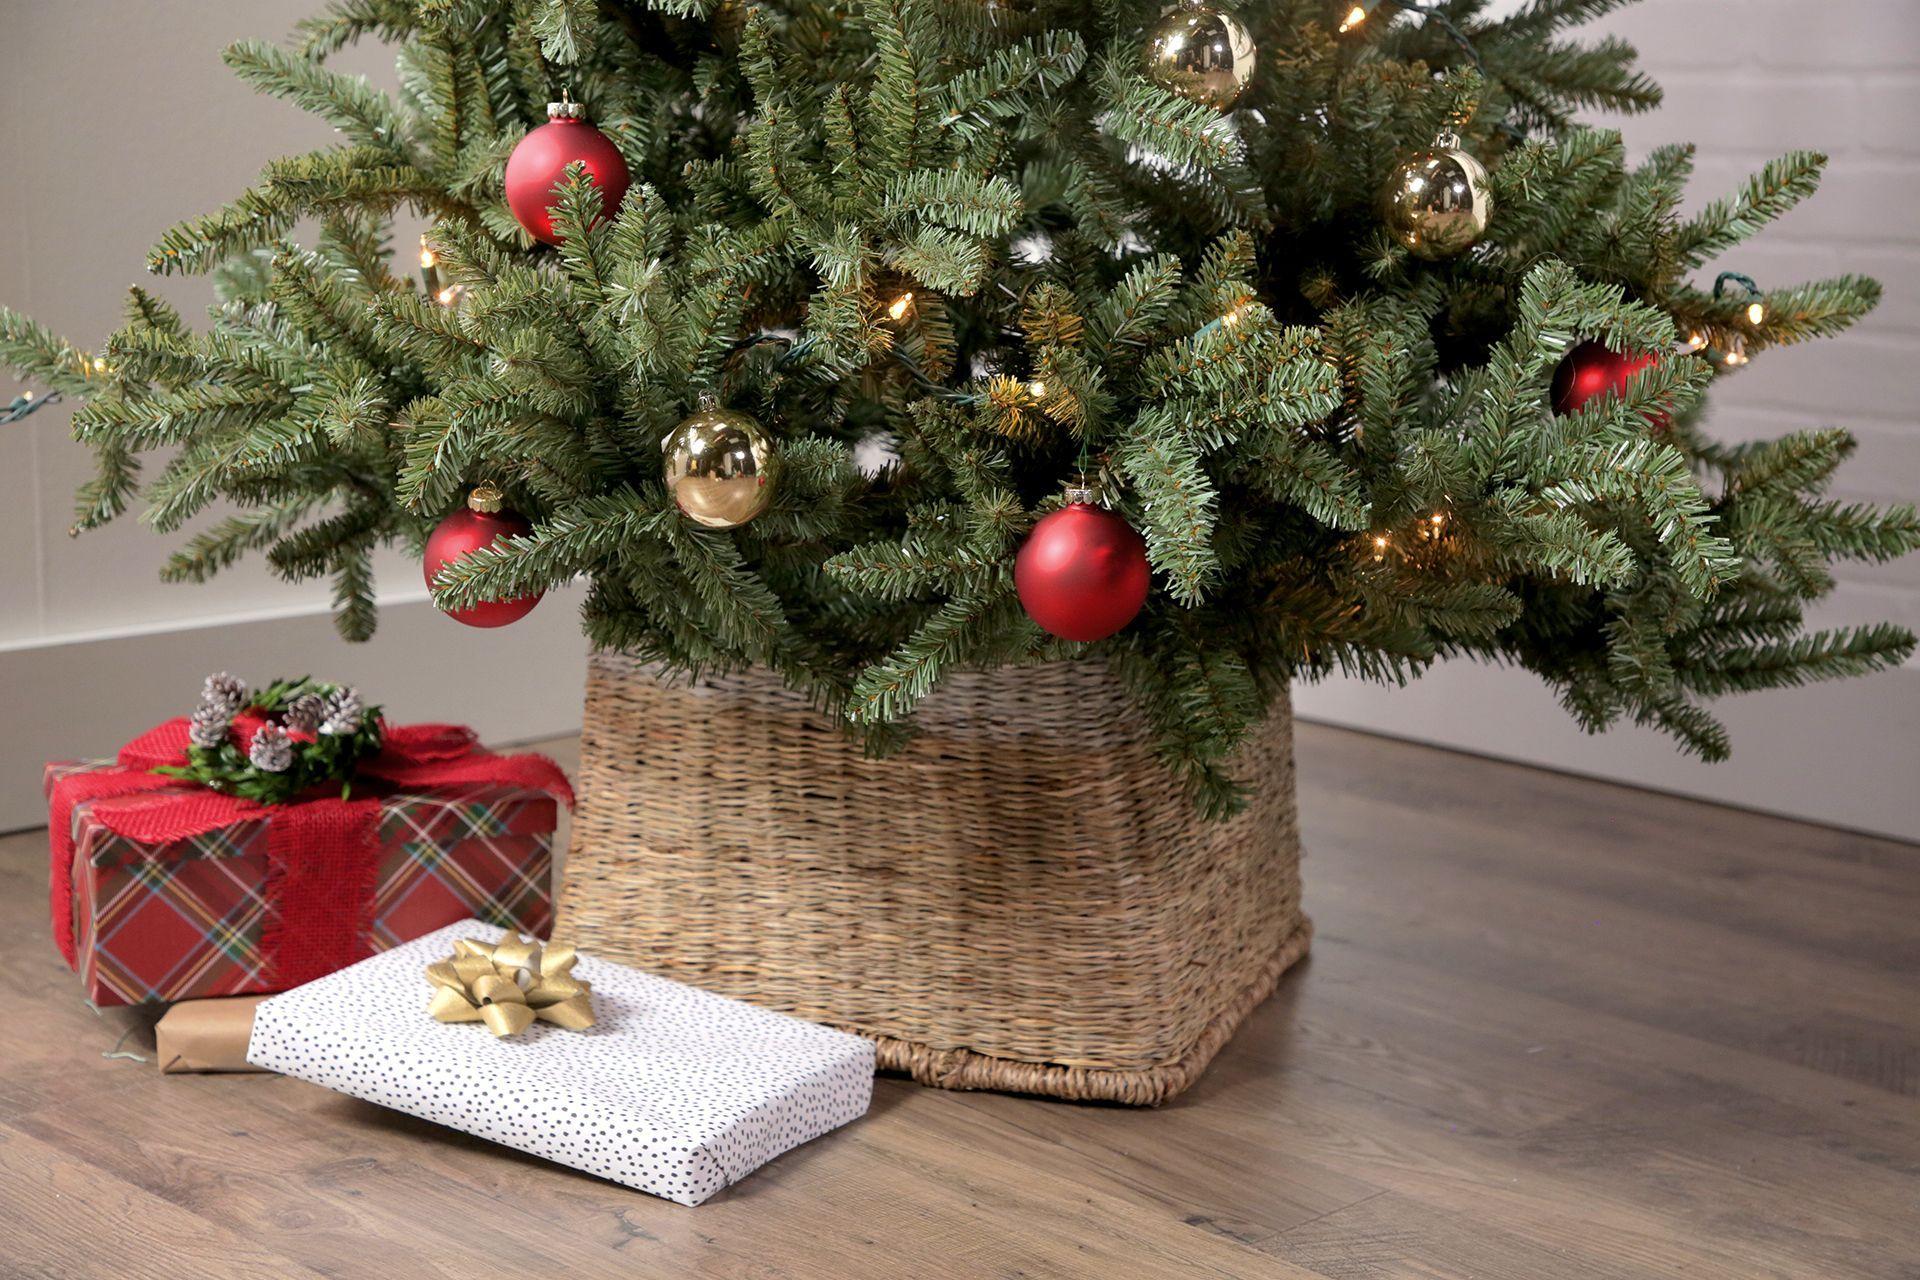 3 Genius Hacks for DIY Christmas Tree Collars